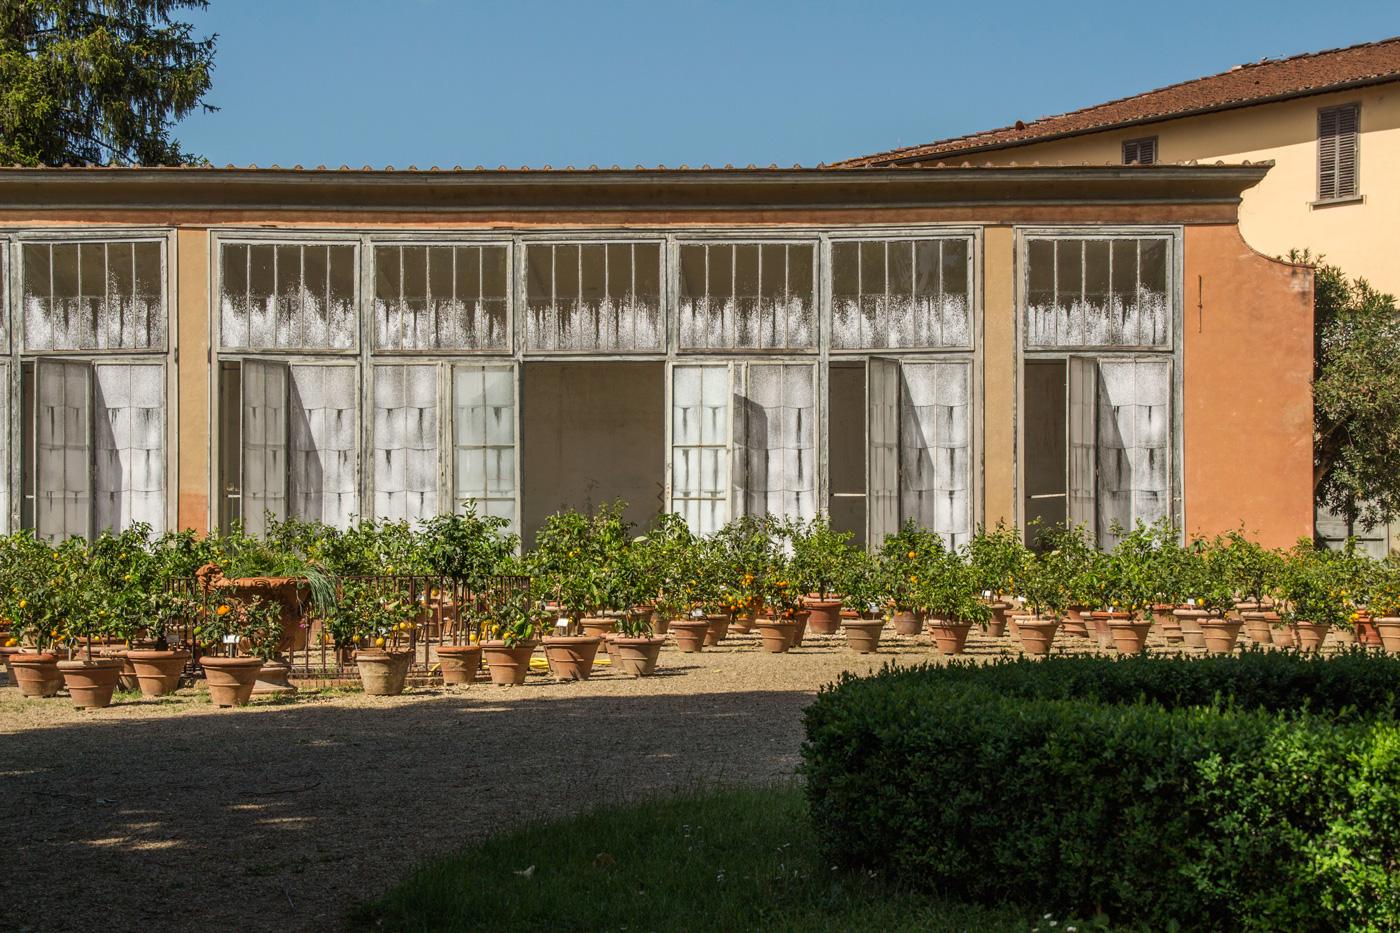 zitronen giardino italy